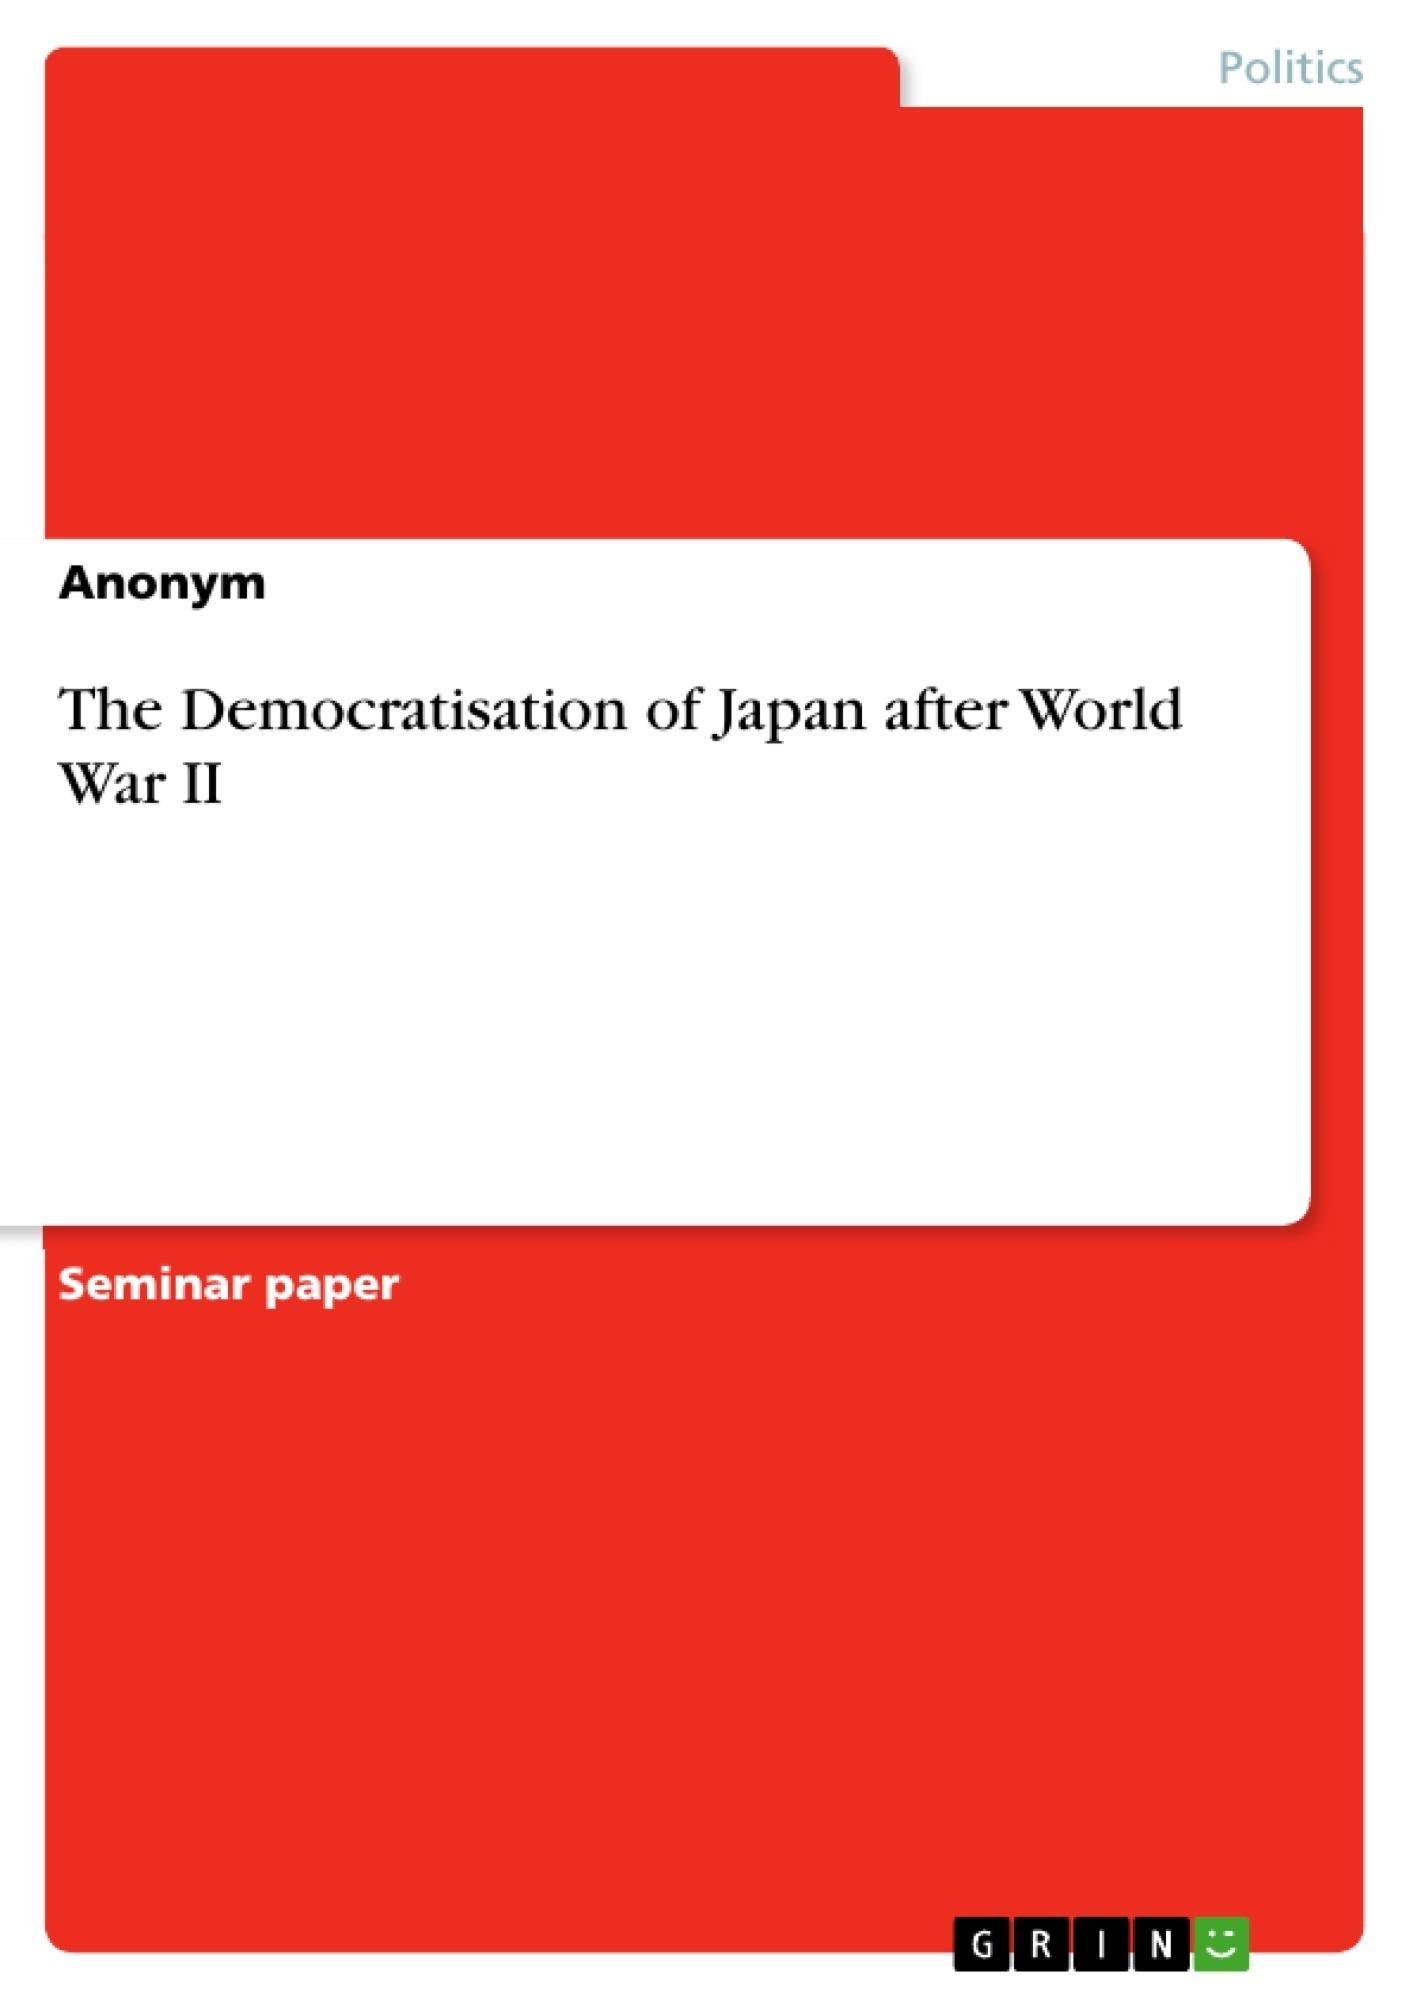 Title: The Democratisation of Japan after World War II